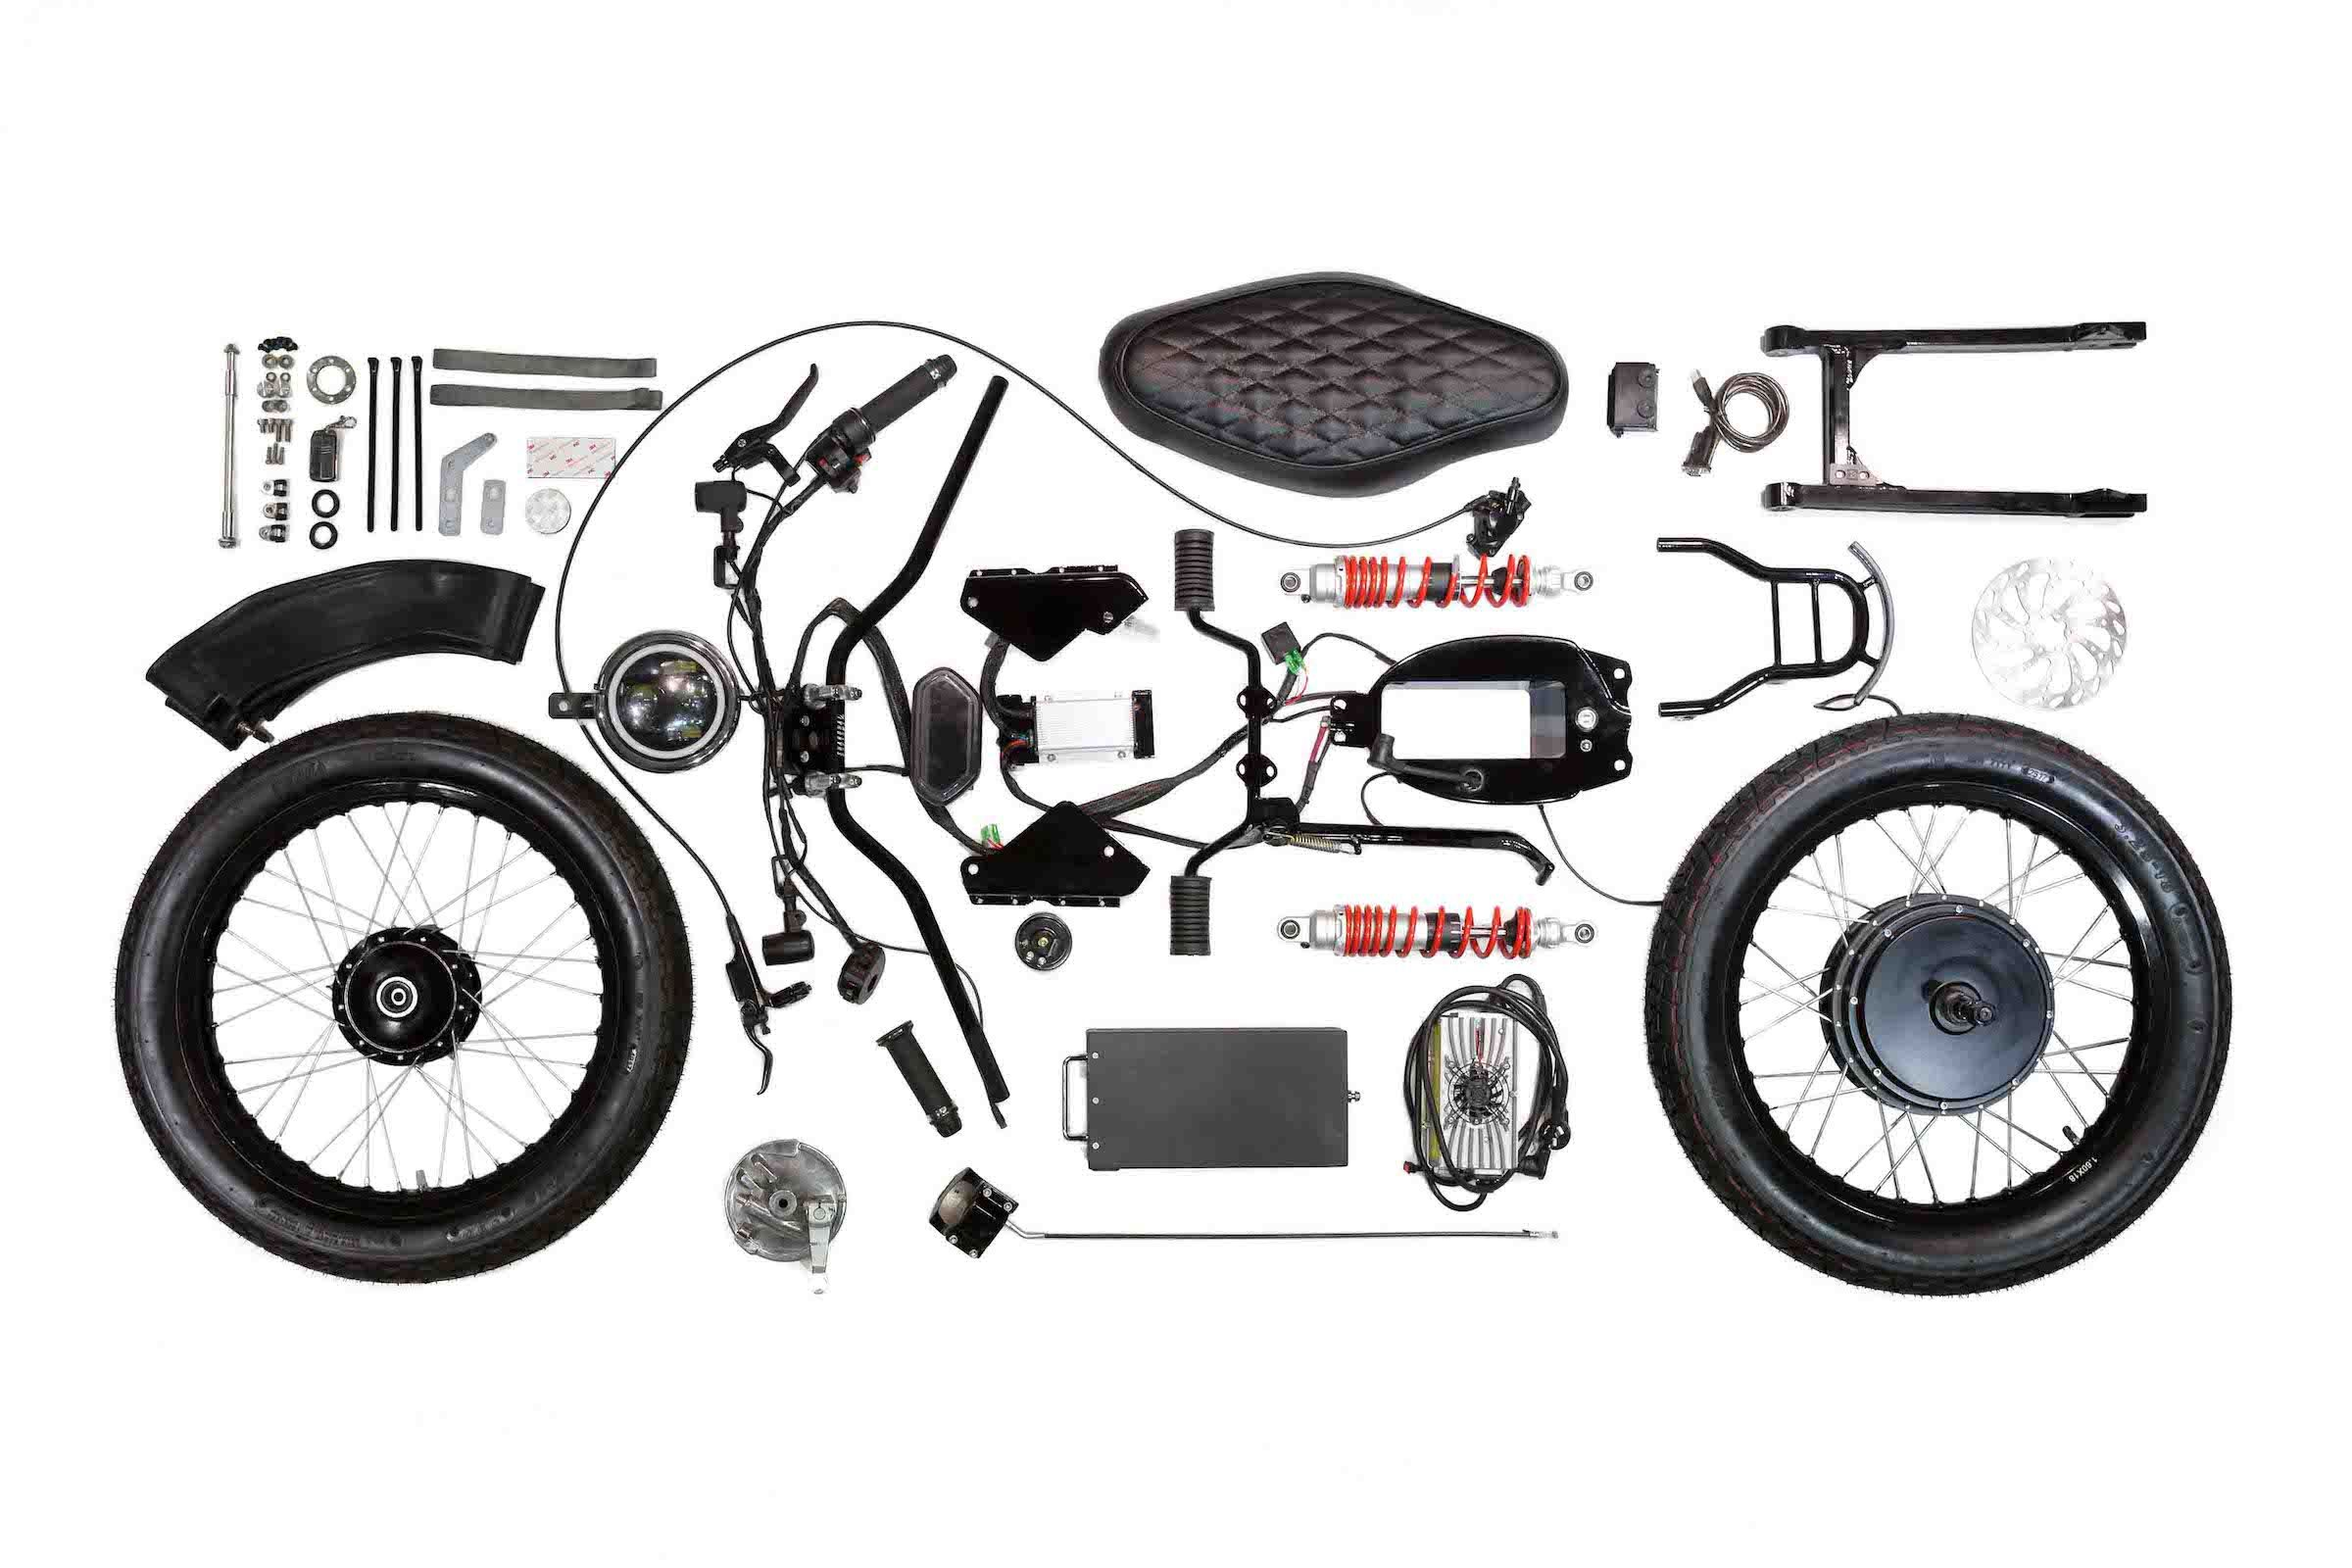 Pin On Motocycle